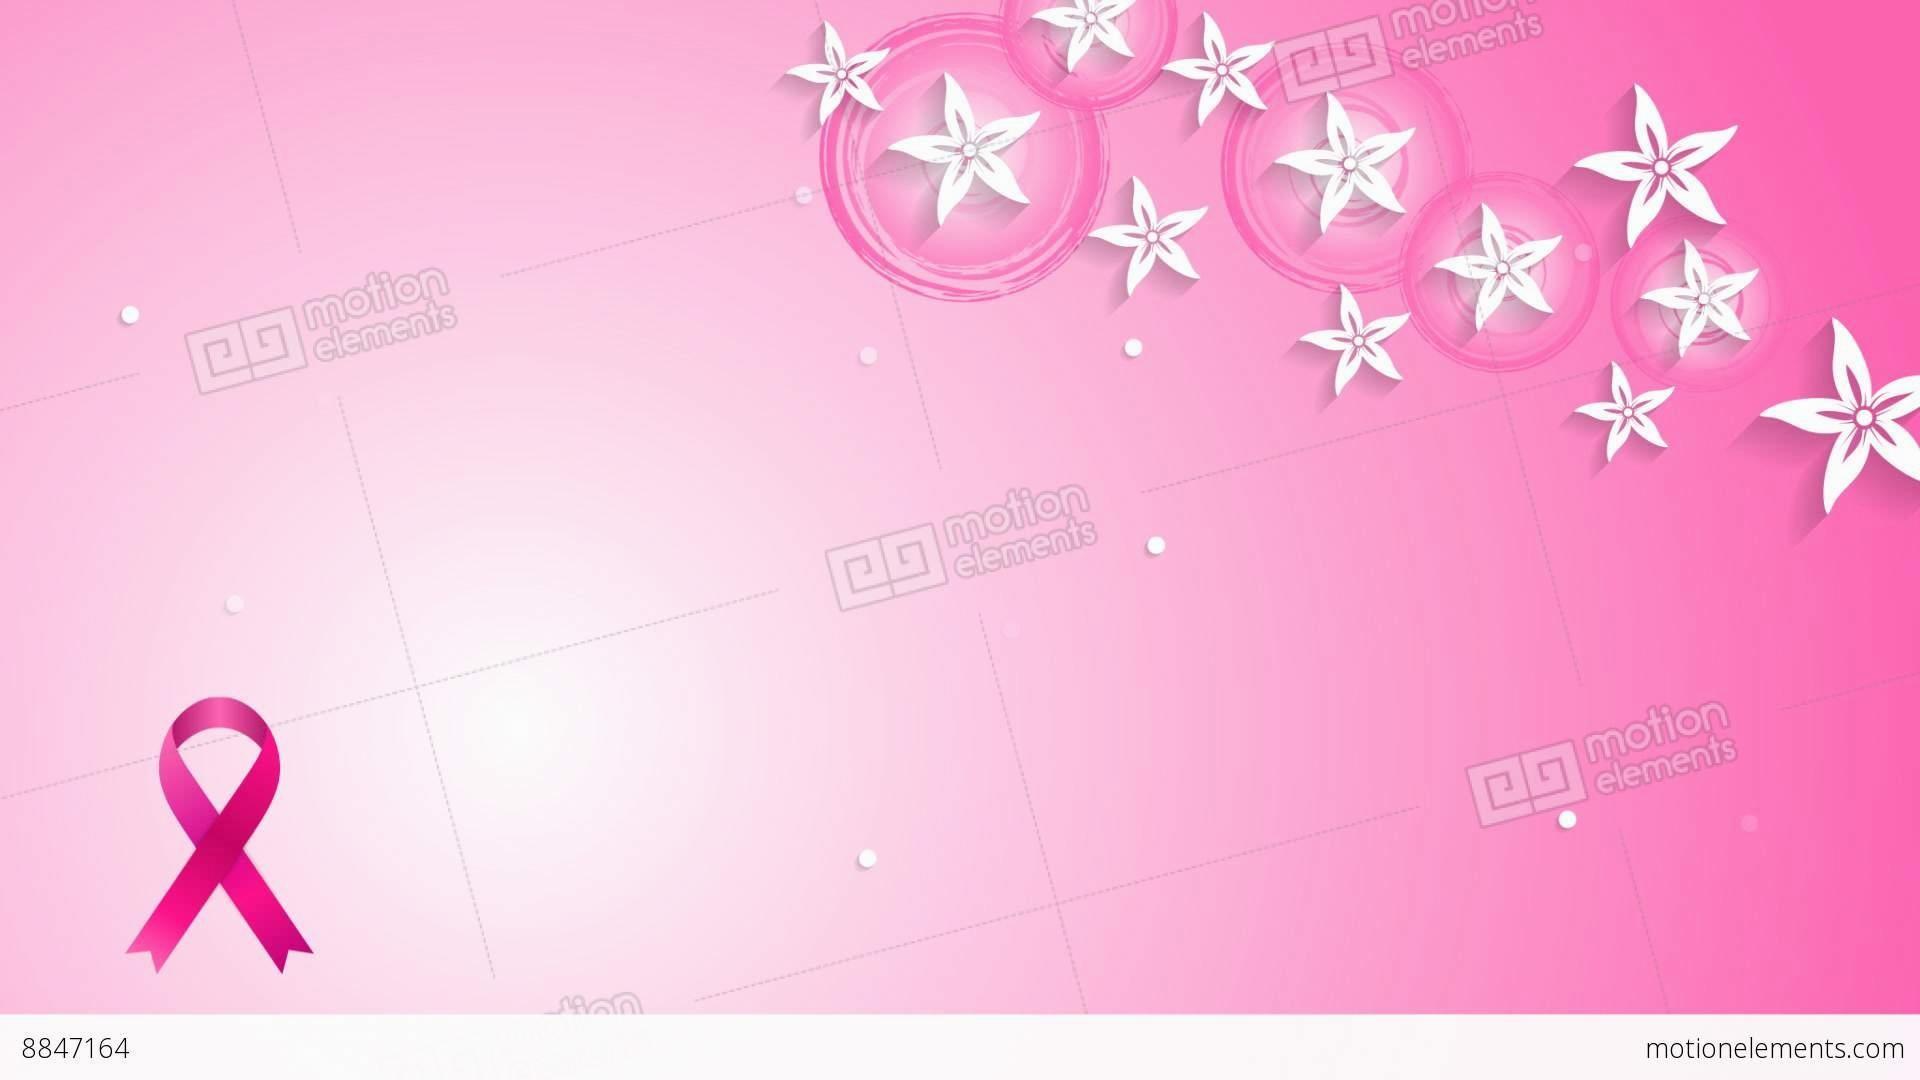 breast cancer awareness wallpaper HD